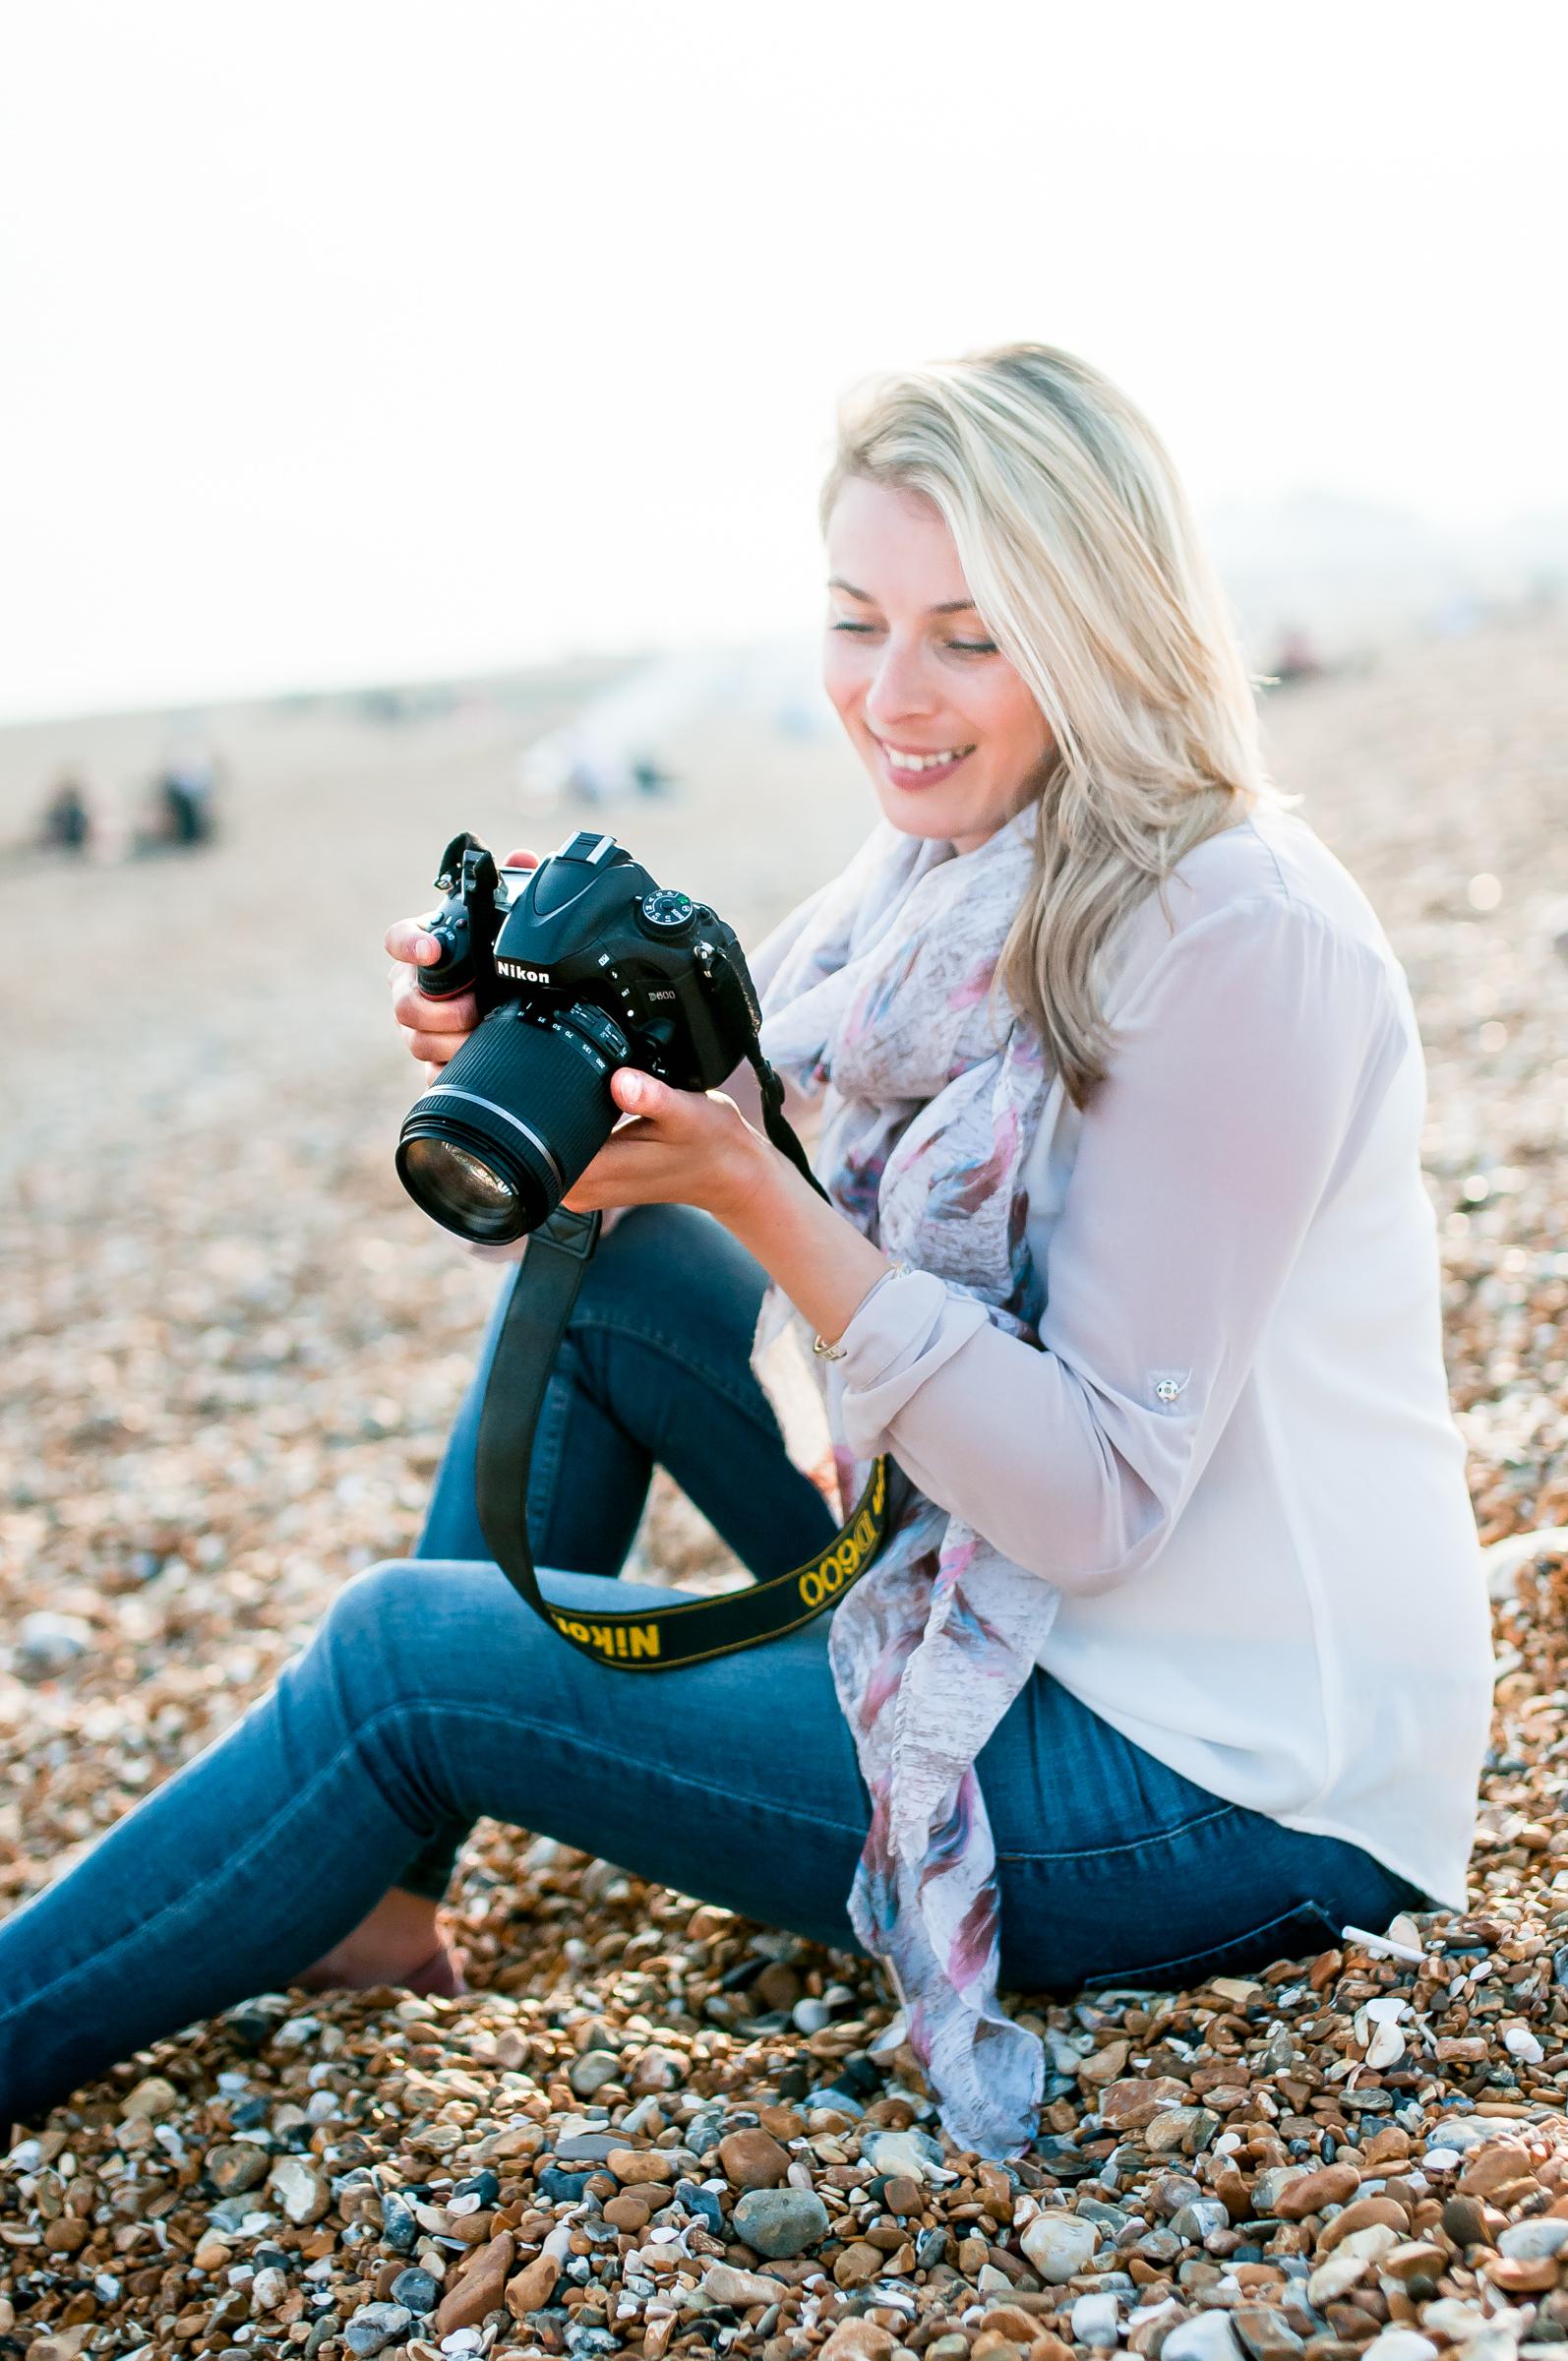 Professional Portrait Photographer based in London, Brighton, UK- Magdalena Smolarska Photography